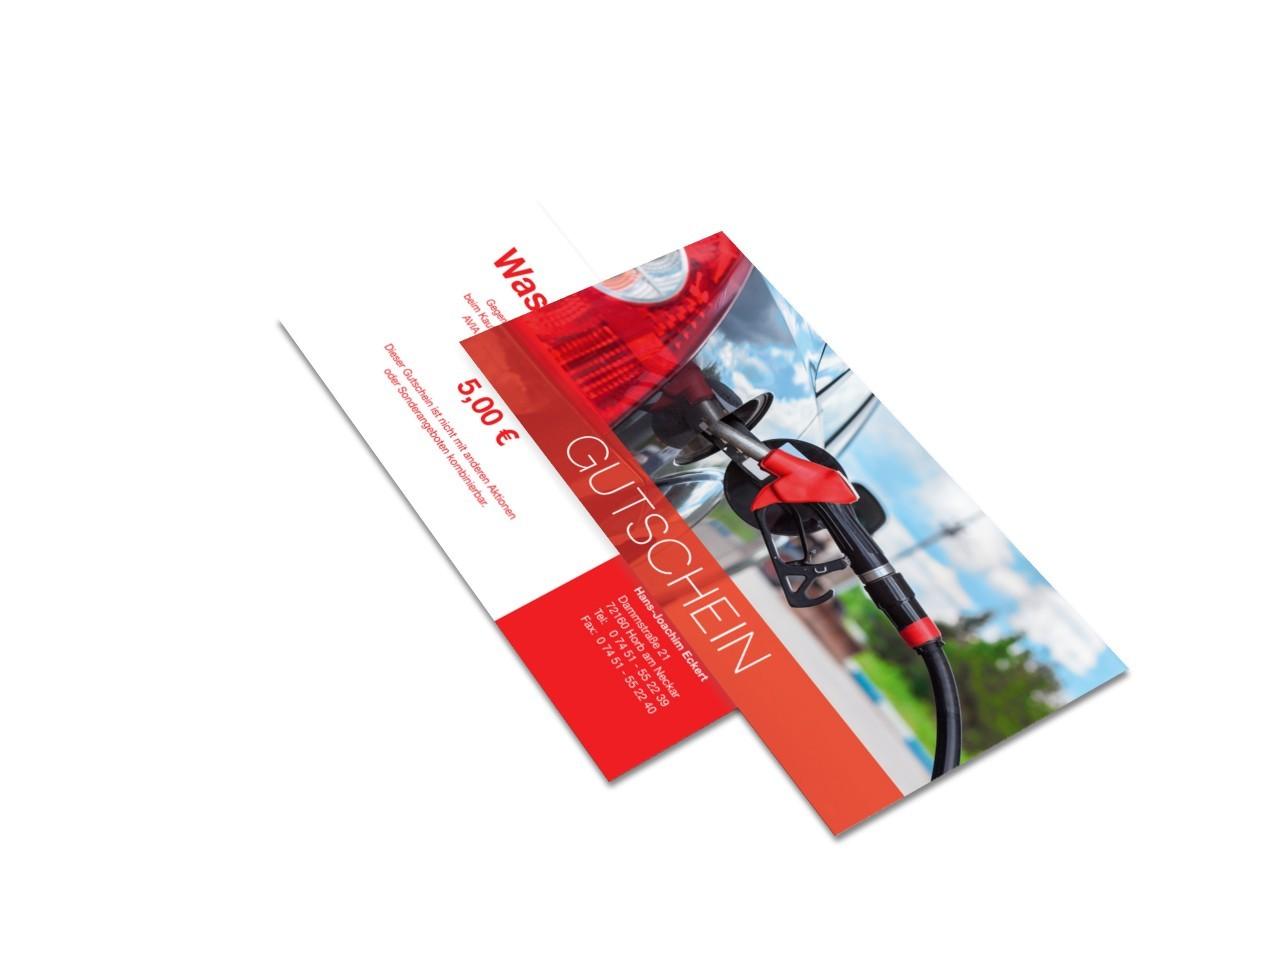 Huzel IT service & design - Gutscheinkarte AVIA Horb